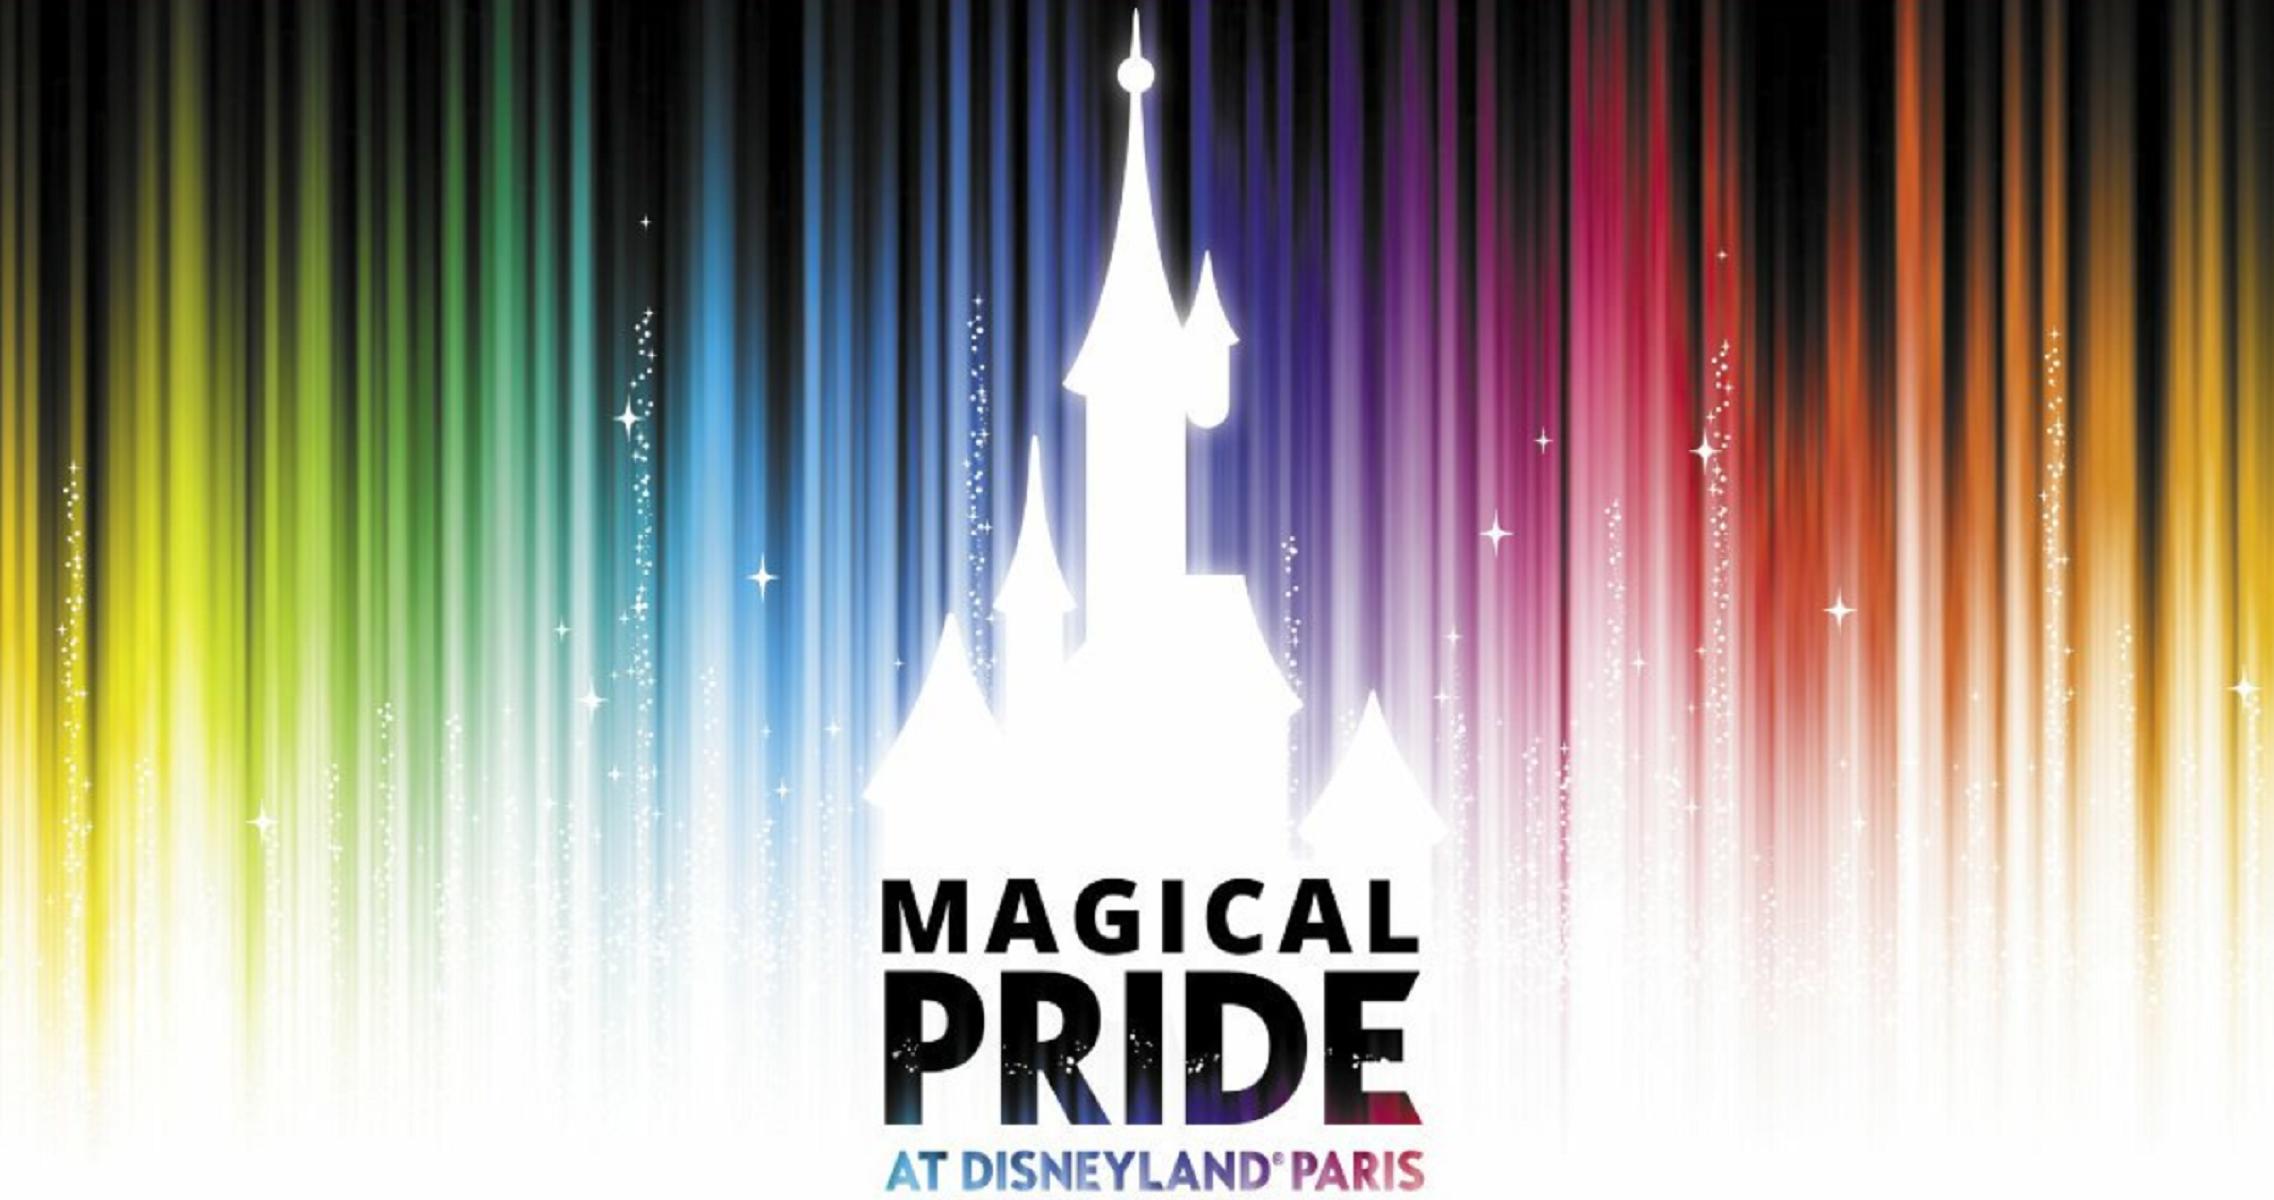 Disneyland Paris, in arrivo il Magical Pride: cosa è?